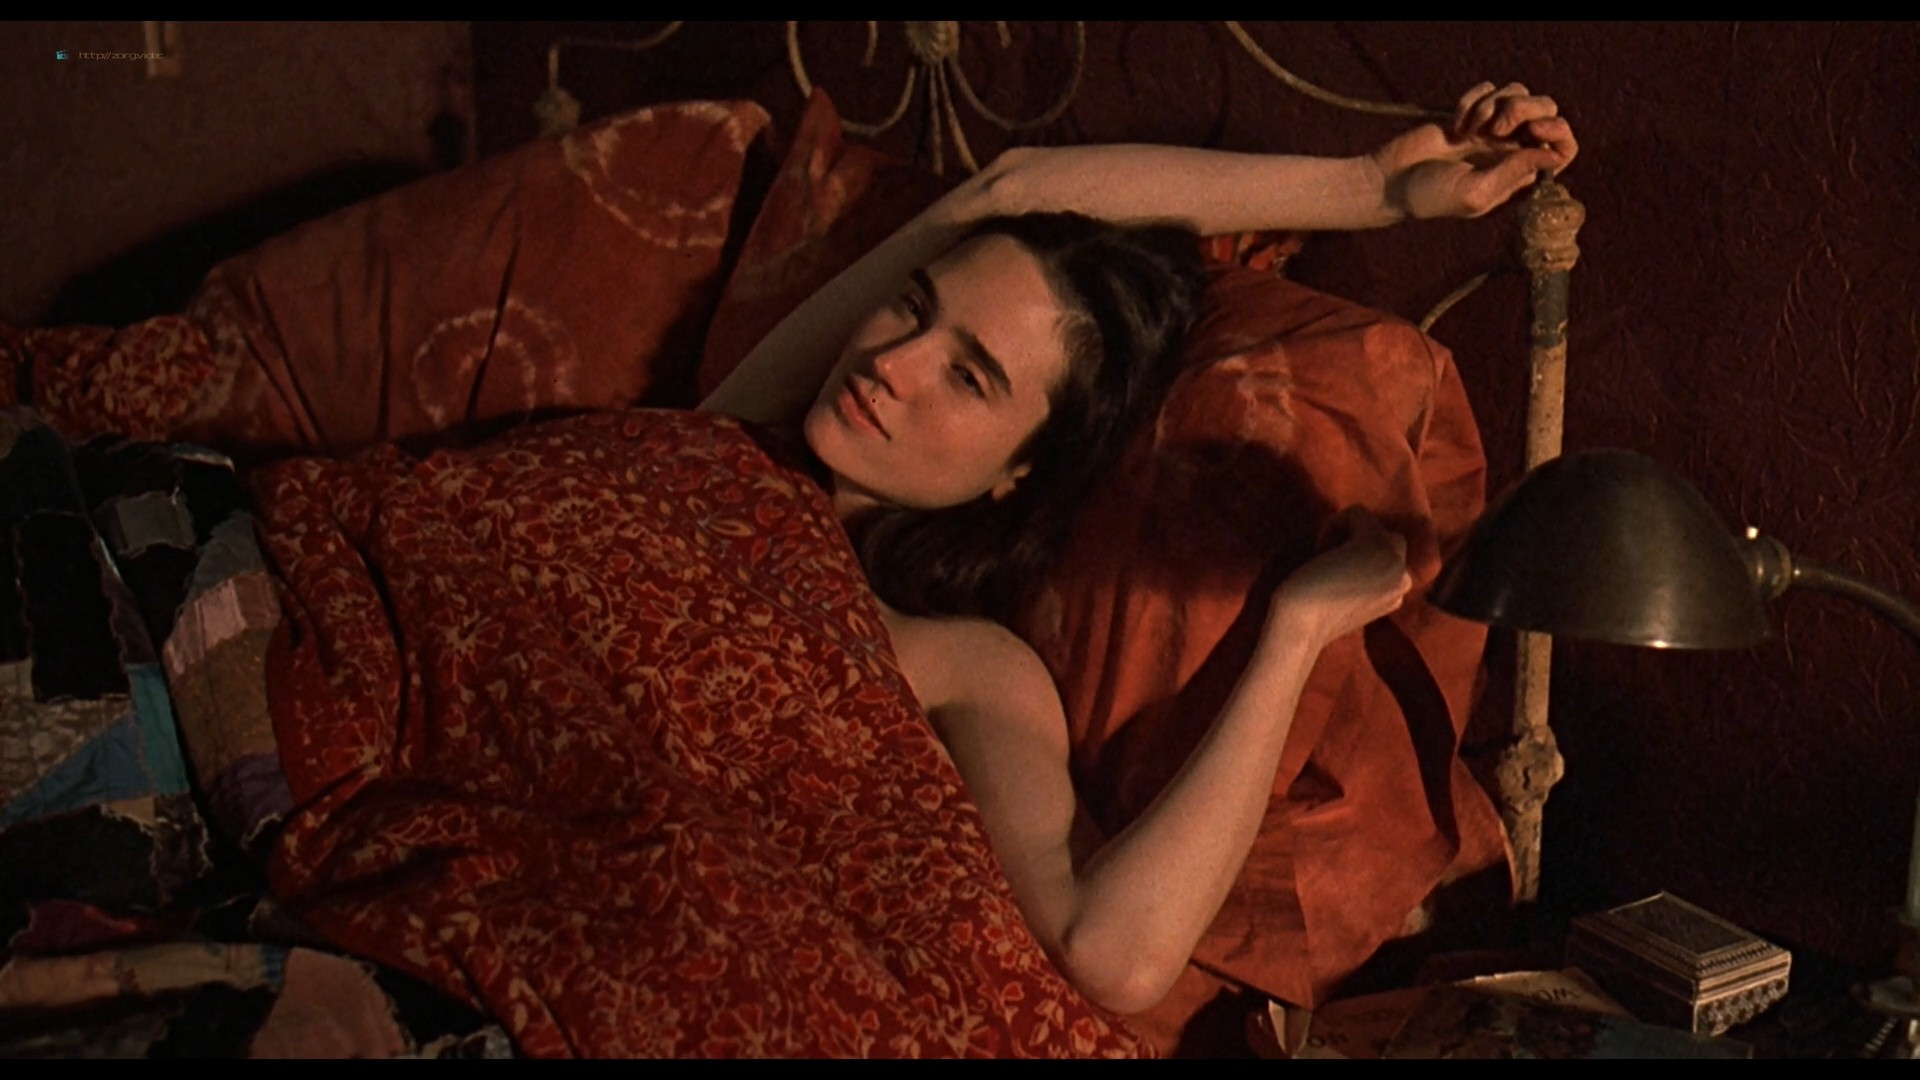 Jennifer Connelly nude side boob sex in – Waking the Dead (2000) HD 1080p BluRay (15)